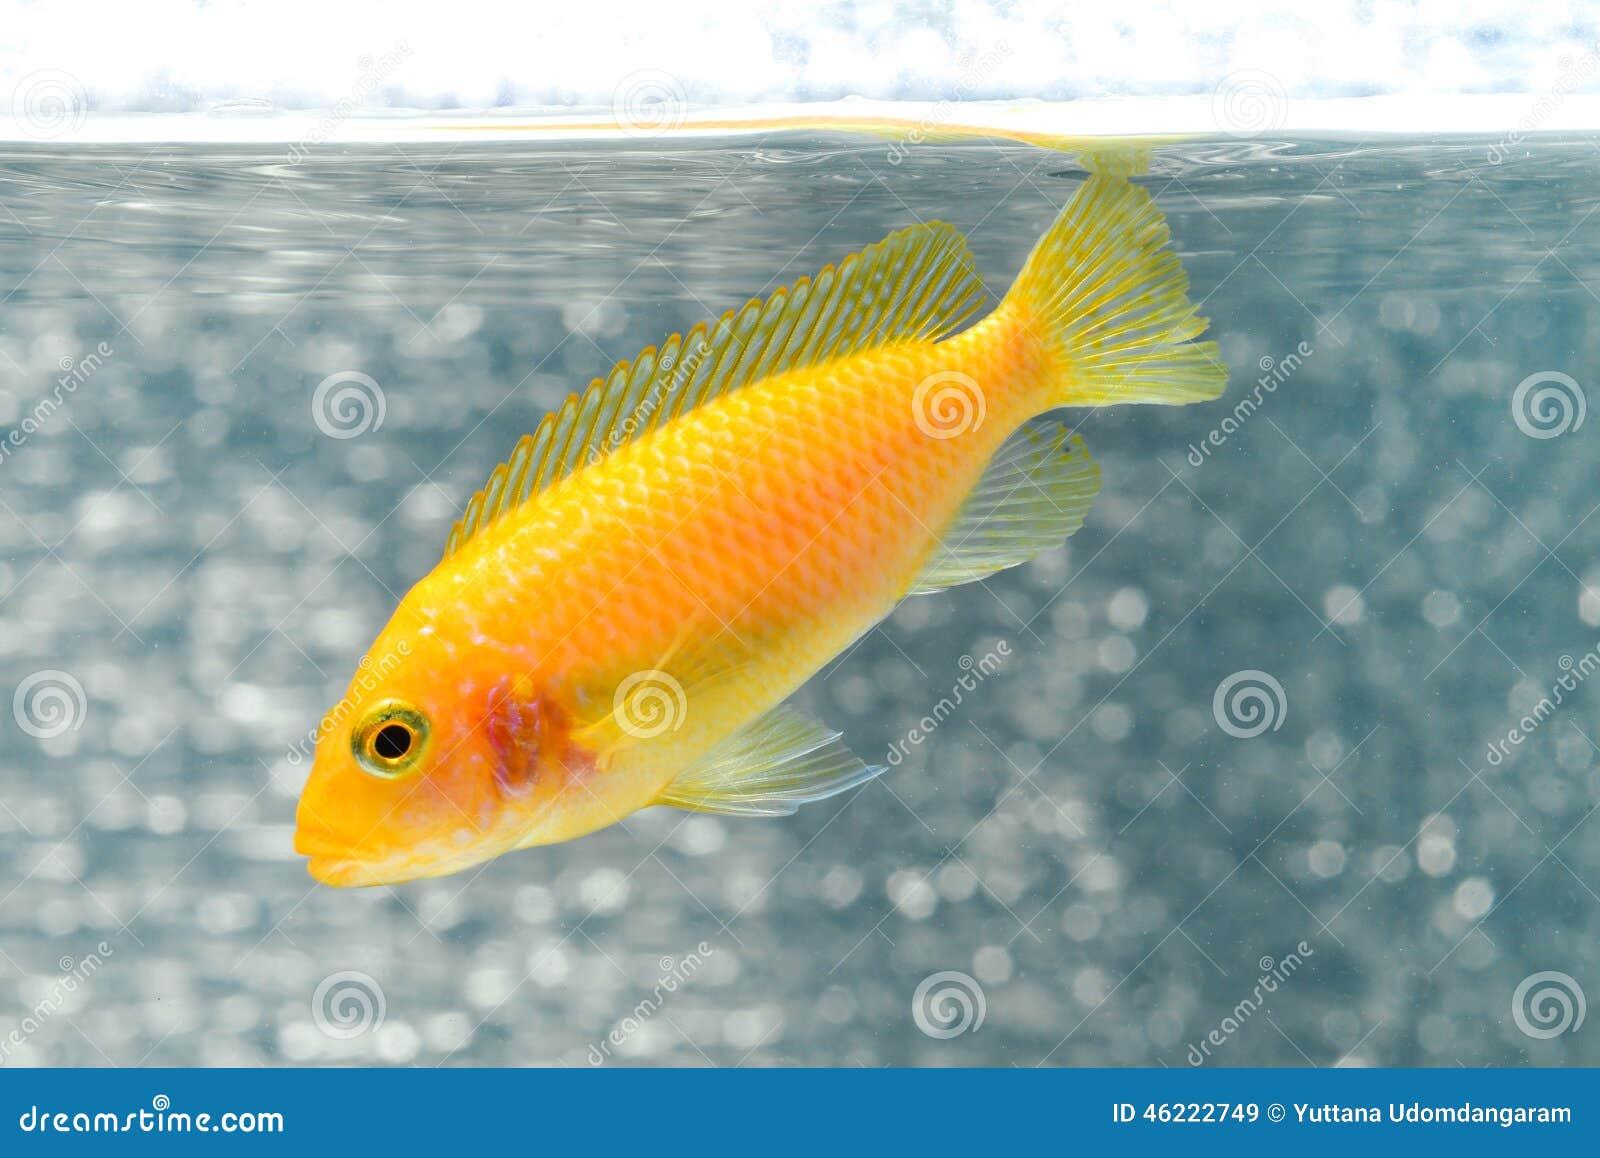 Cichlid fish stock photo image 46222749 for Cichlid fish food